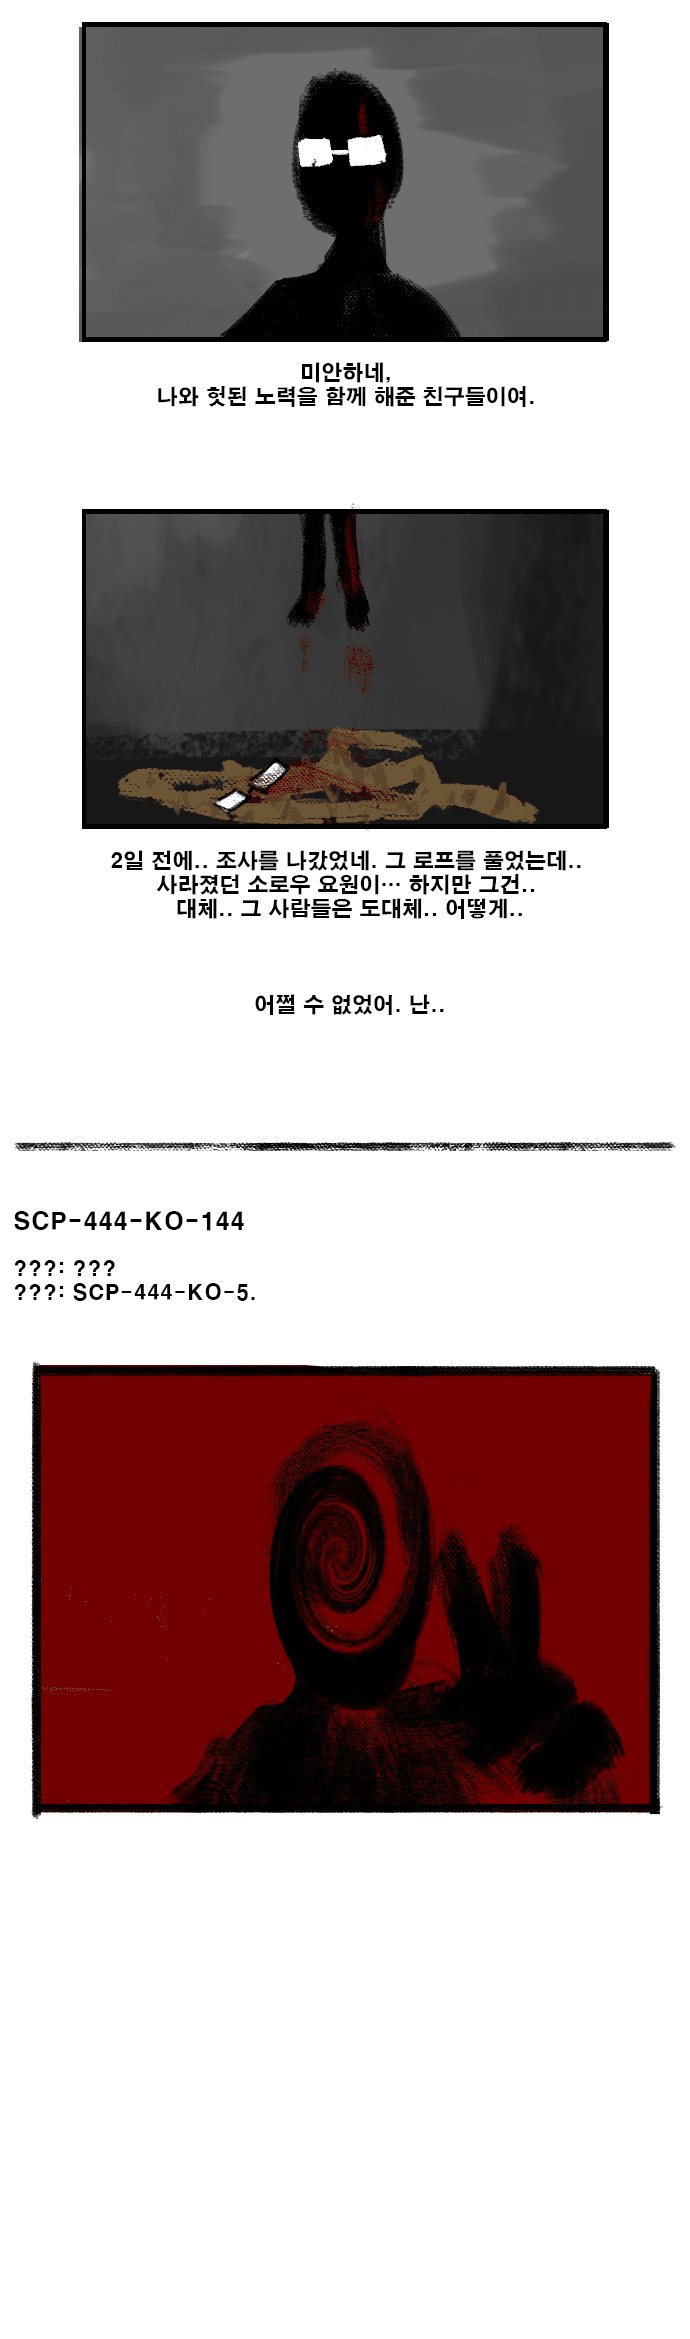 viewimage.php?id=3ebec020eac736a26fabdfba18&no=24b0d769e1d32ca73dec8ffa11d02831046ced35d9c2bd23e7054e3c2e8d67a8e5c7a2868c26adae567fd5f9302fb61d2973053c7f90371ae3e8d47f90c2c0e21e882a9a400d9bd8